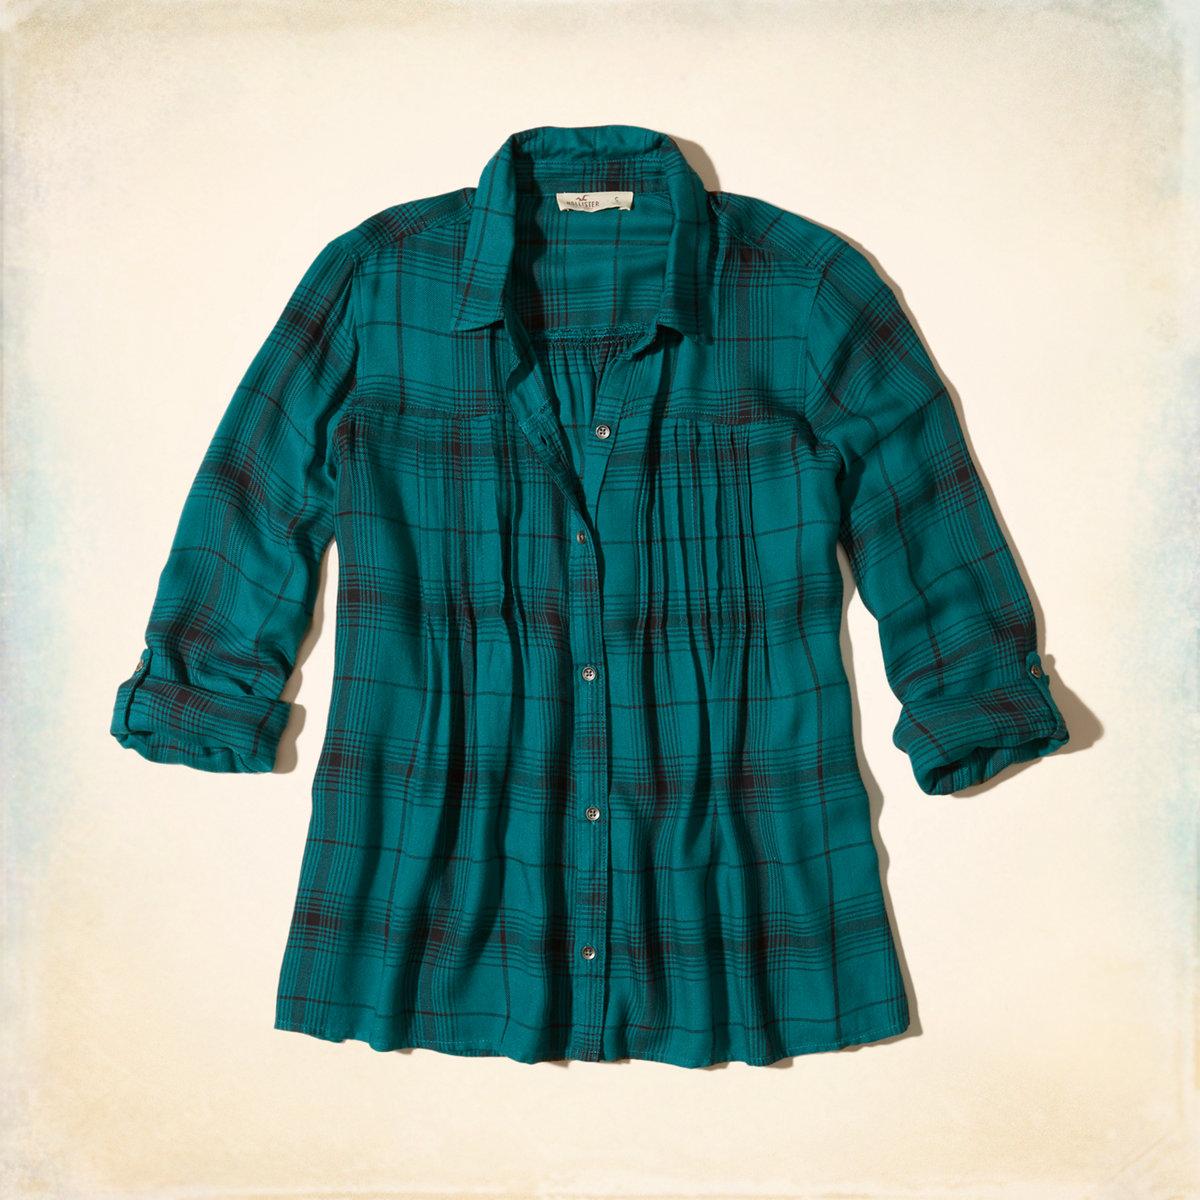 Pintuck Plaid Shirt